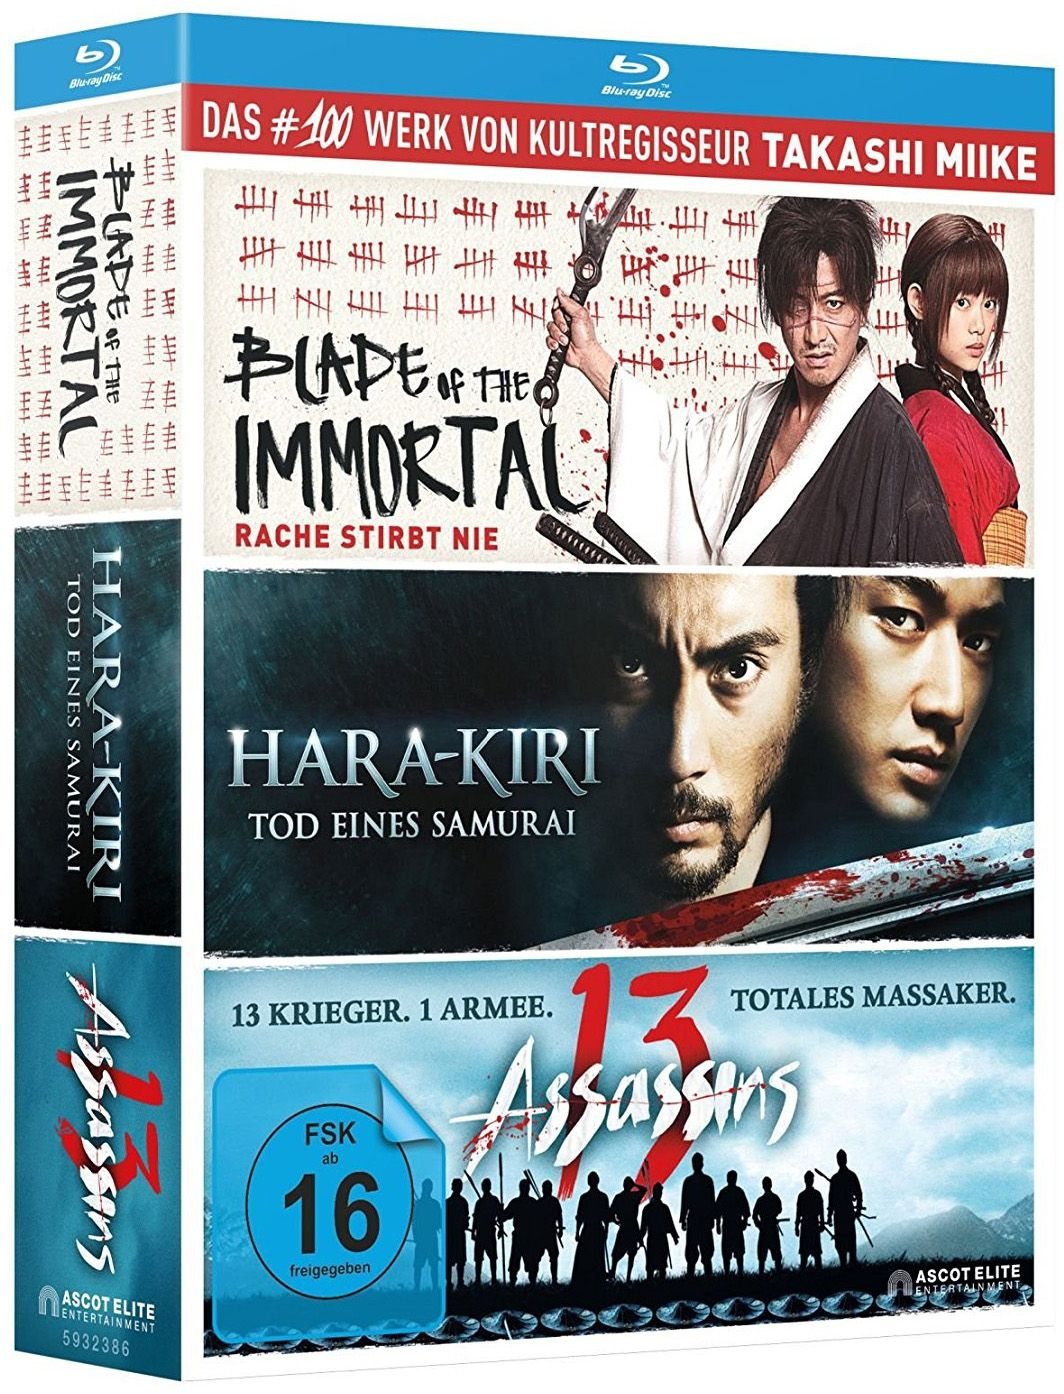 Blade of the Immortal / Hara-Kiri - Death of a Samurai / 13 Assassins (Takashi Miike Box) (3 Discs) (BLURAY)